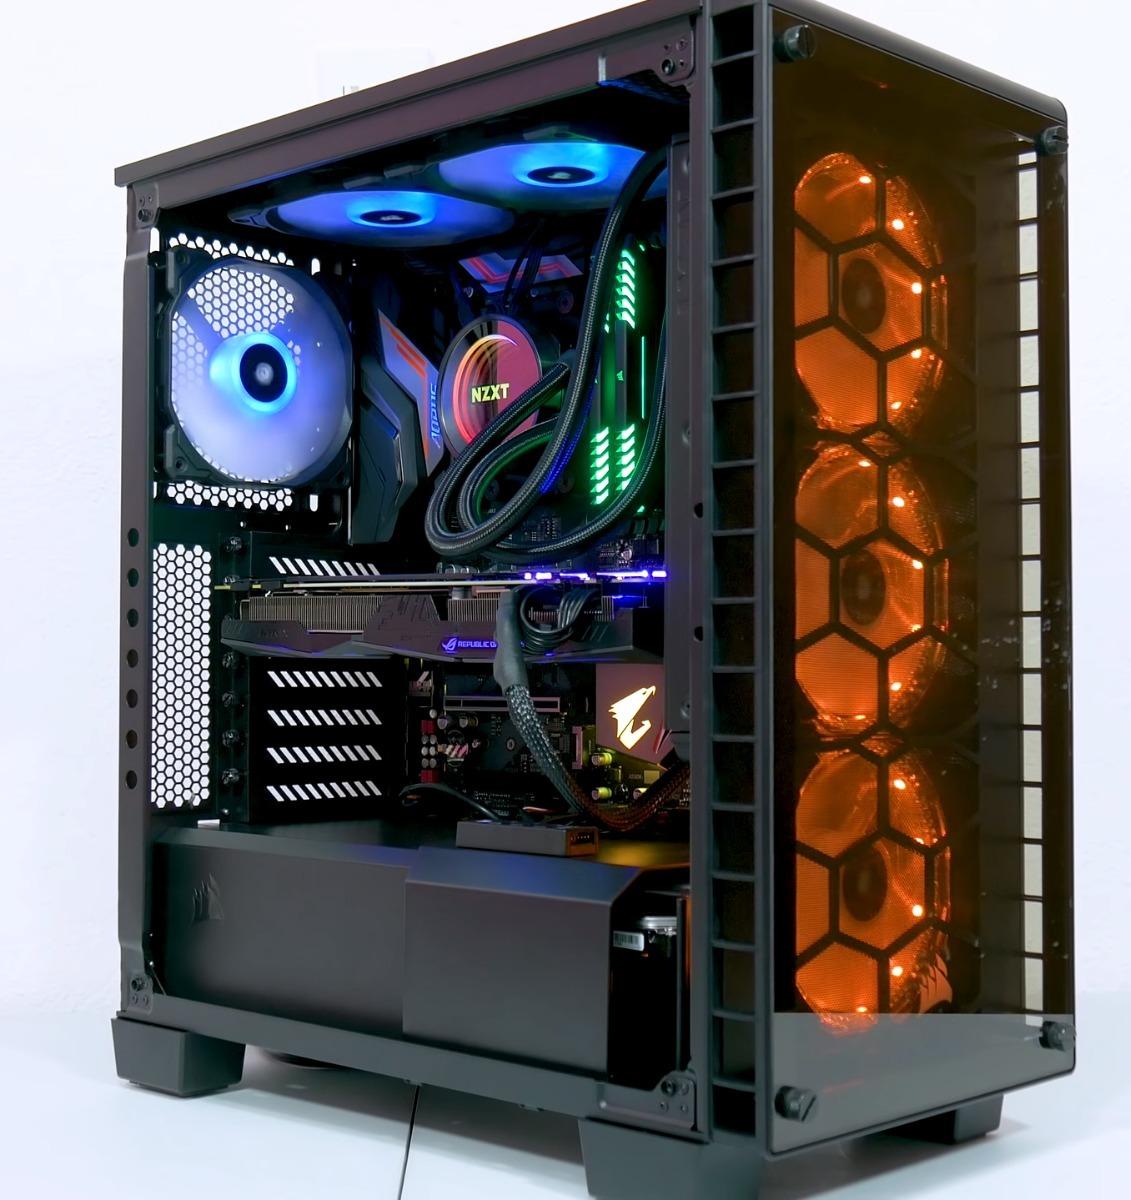 Pc Gamer Armada I7 8700k Gtx 1080ti 16gb Ram 512 Ssd M 2 - $ 121 000,00